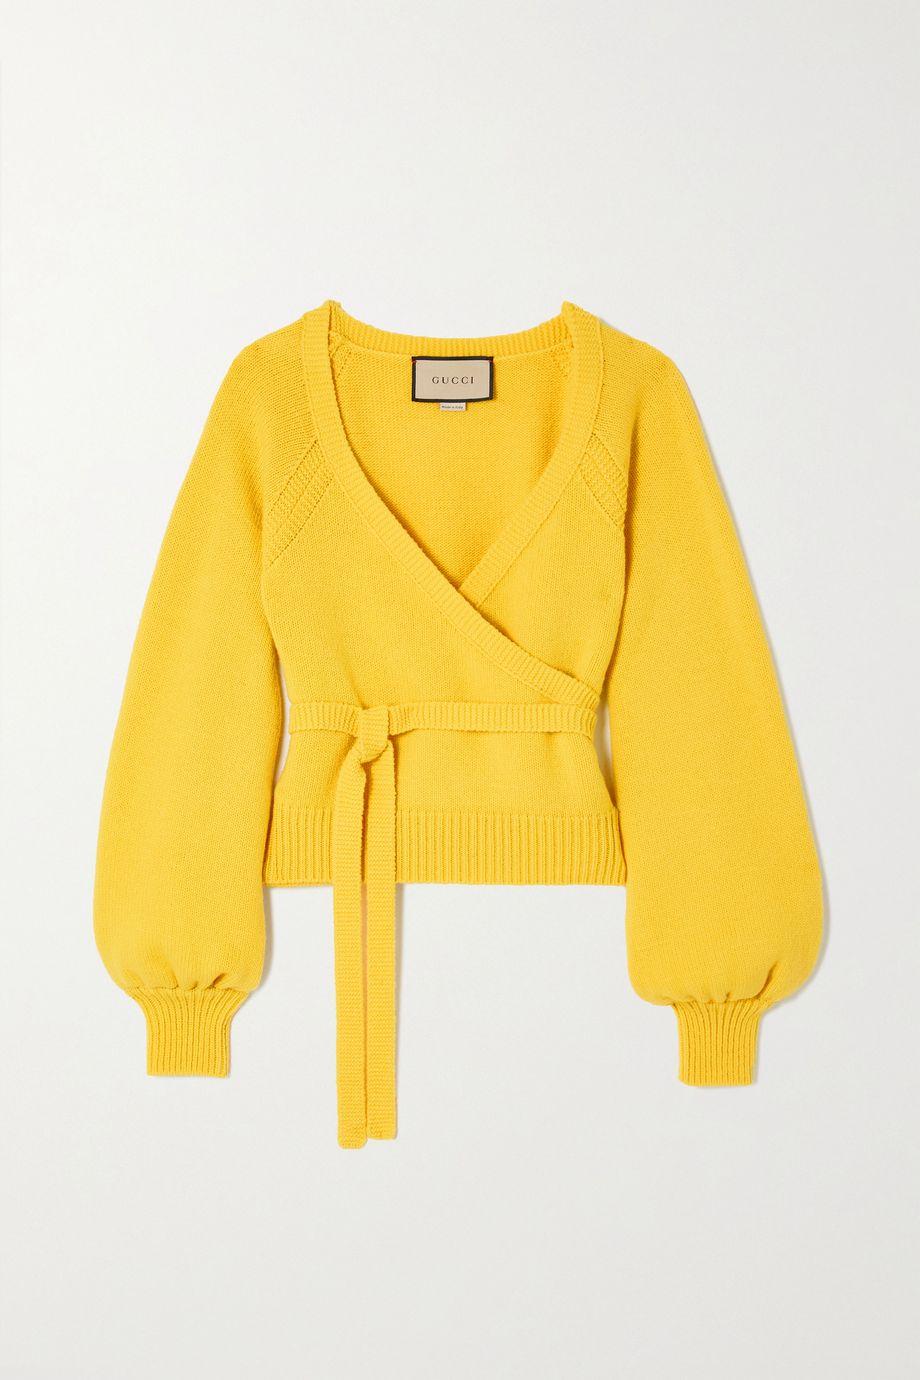 Gucci Wool wrap sweater